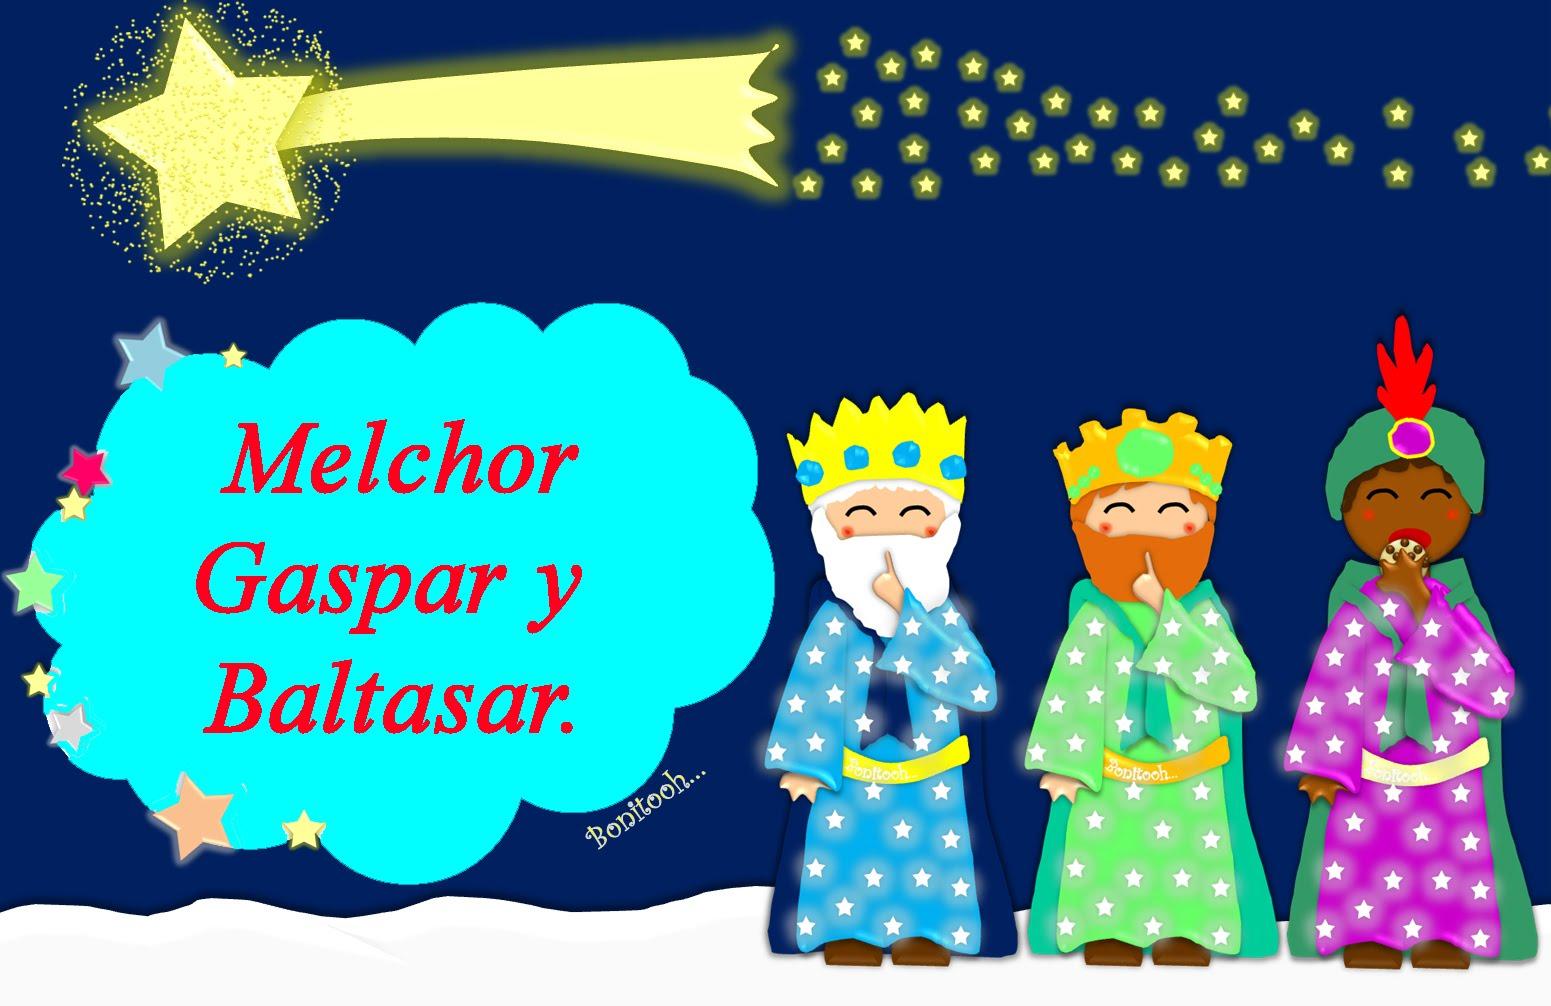 http://navidad.es/wp-content/uploads/2013/01/reyes-magos-copia.jpg